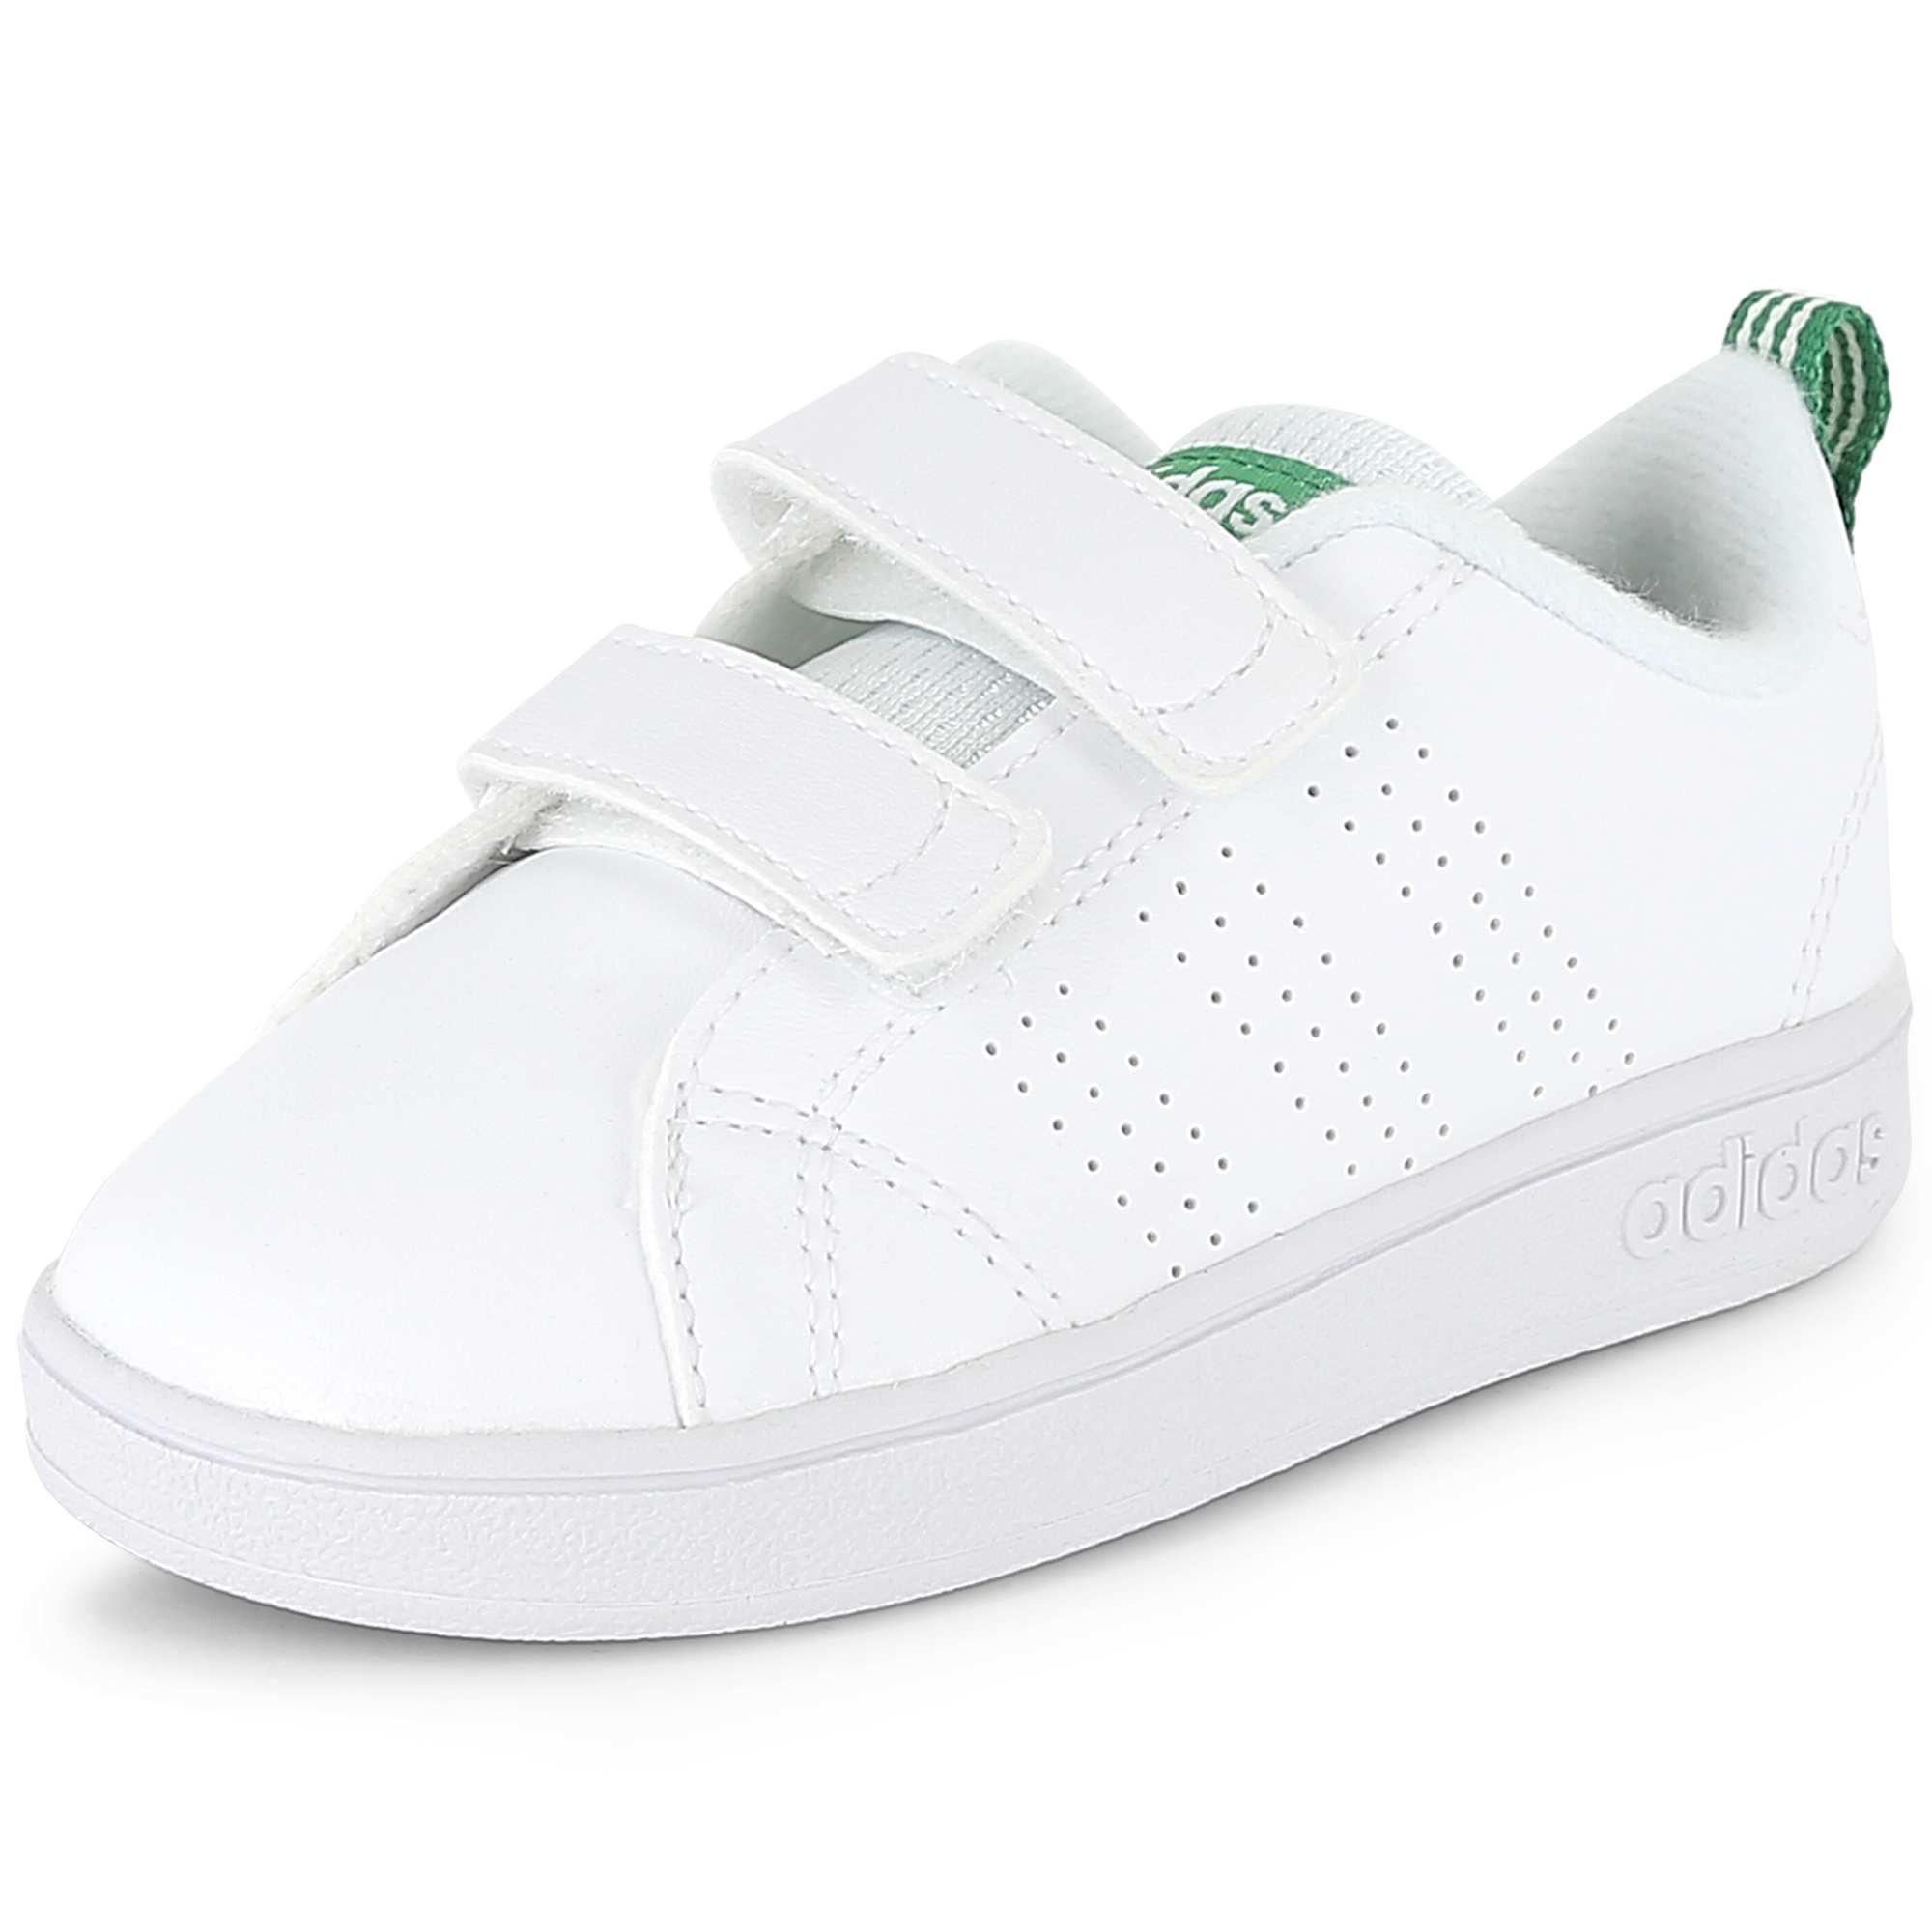 1bd4f2775f7 Ténis  Adidas VS Advantage Clean  Menino 3-12 anos - blanco - Kiabi ...